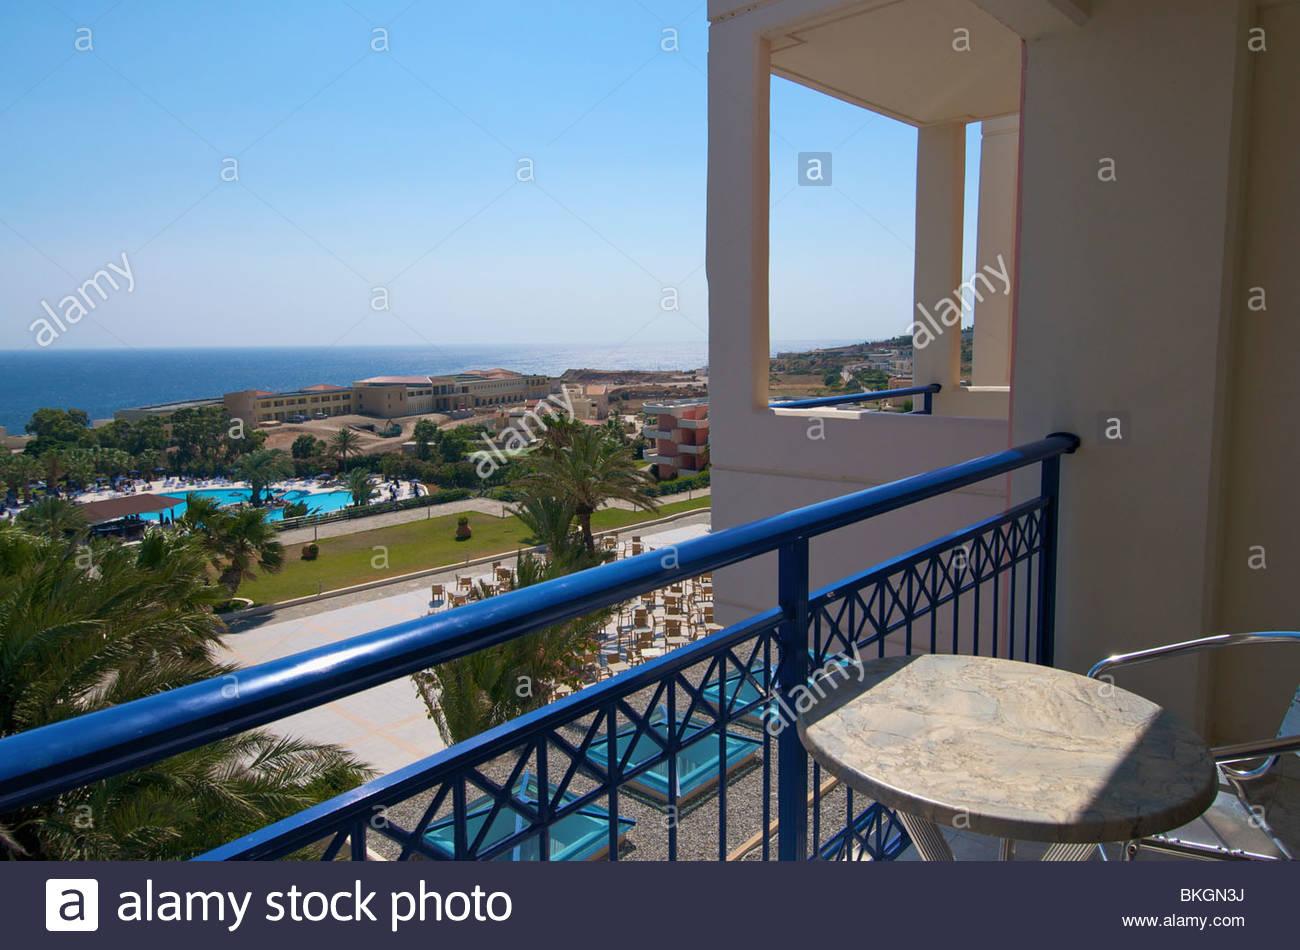 Kresten Palace 4 (Greece. RhodesKalithea): photos, room description, features of the service and reviews 41